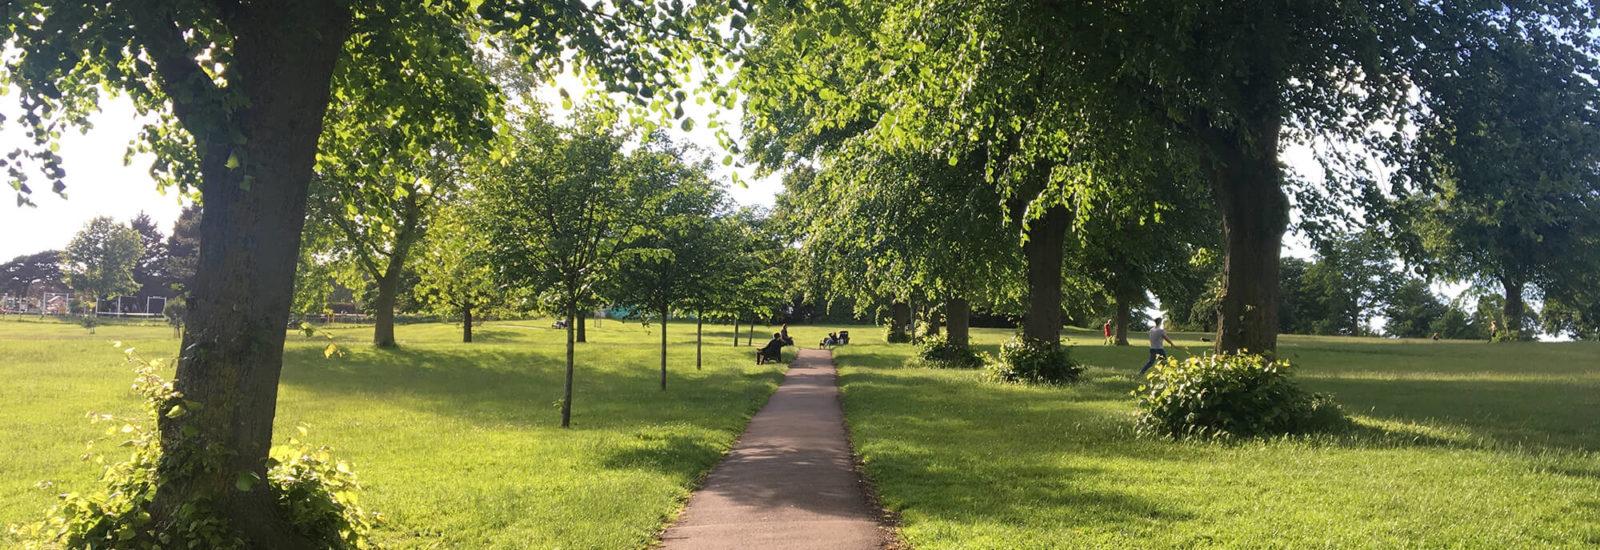 Image of Victoria Park